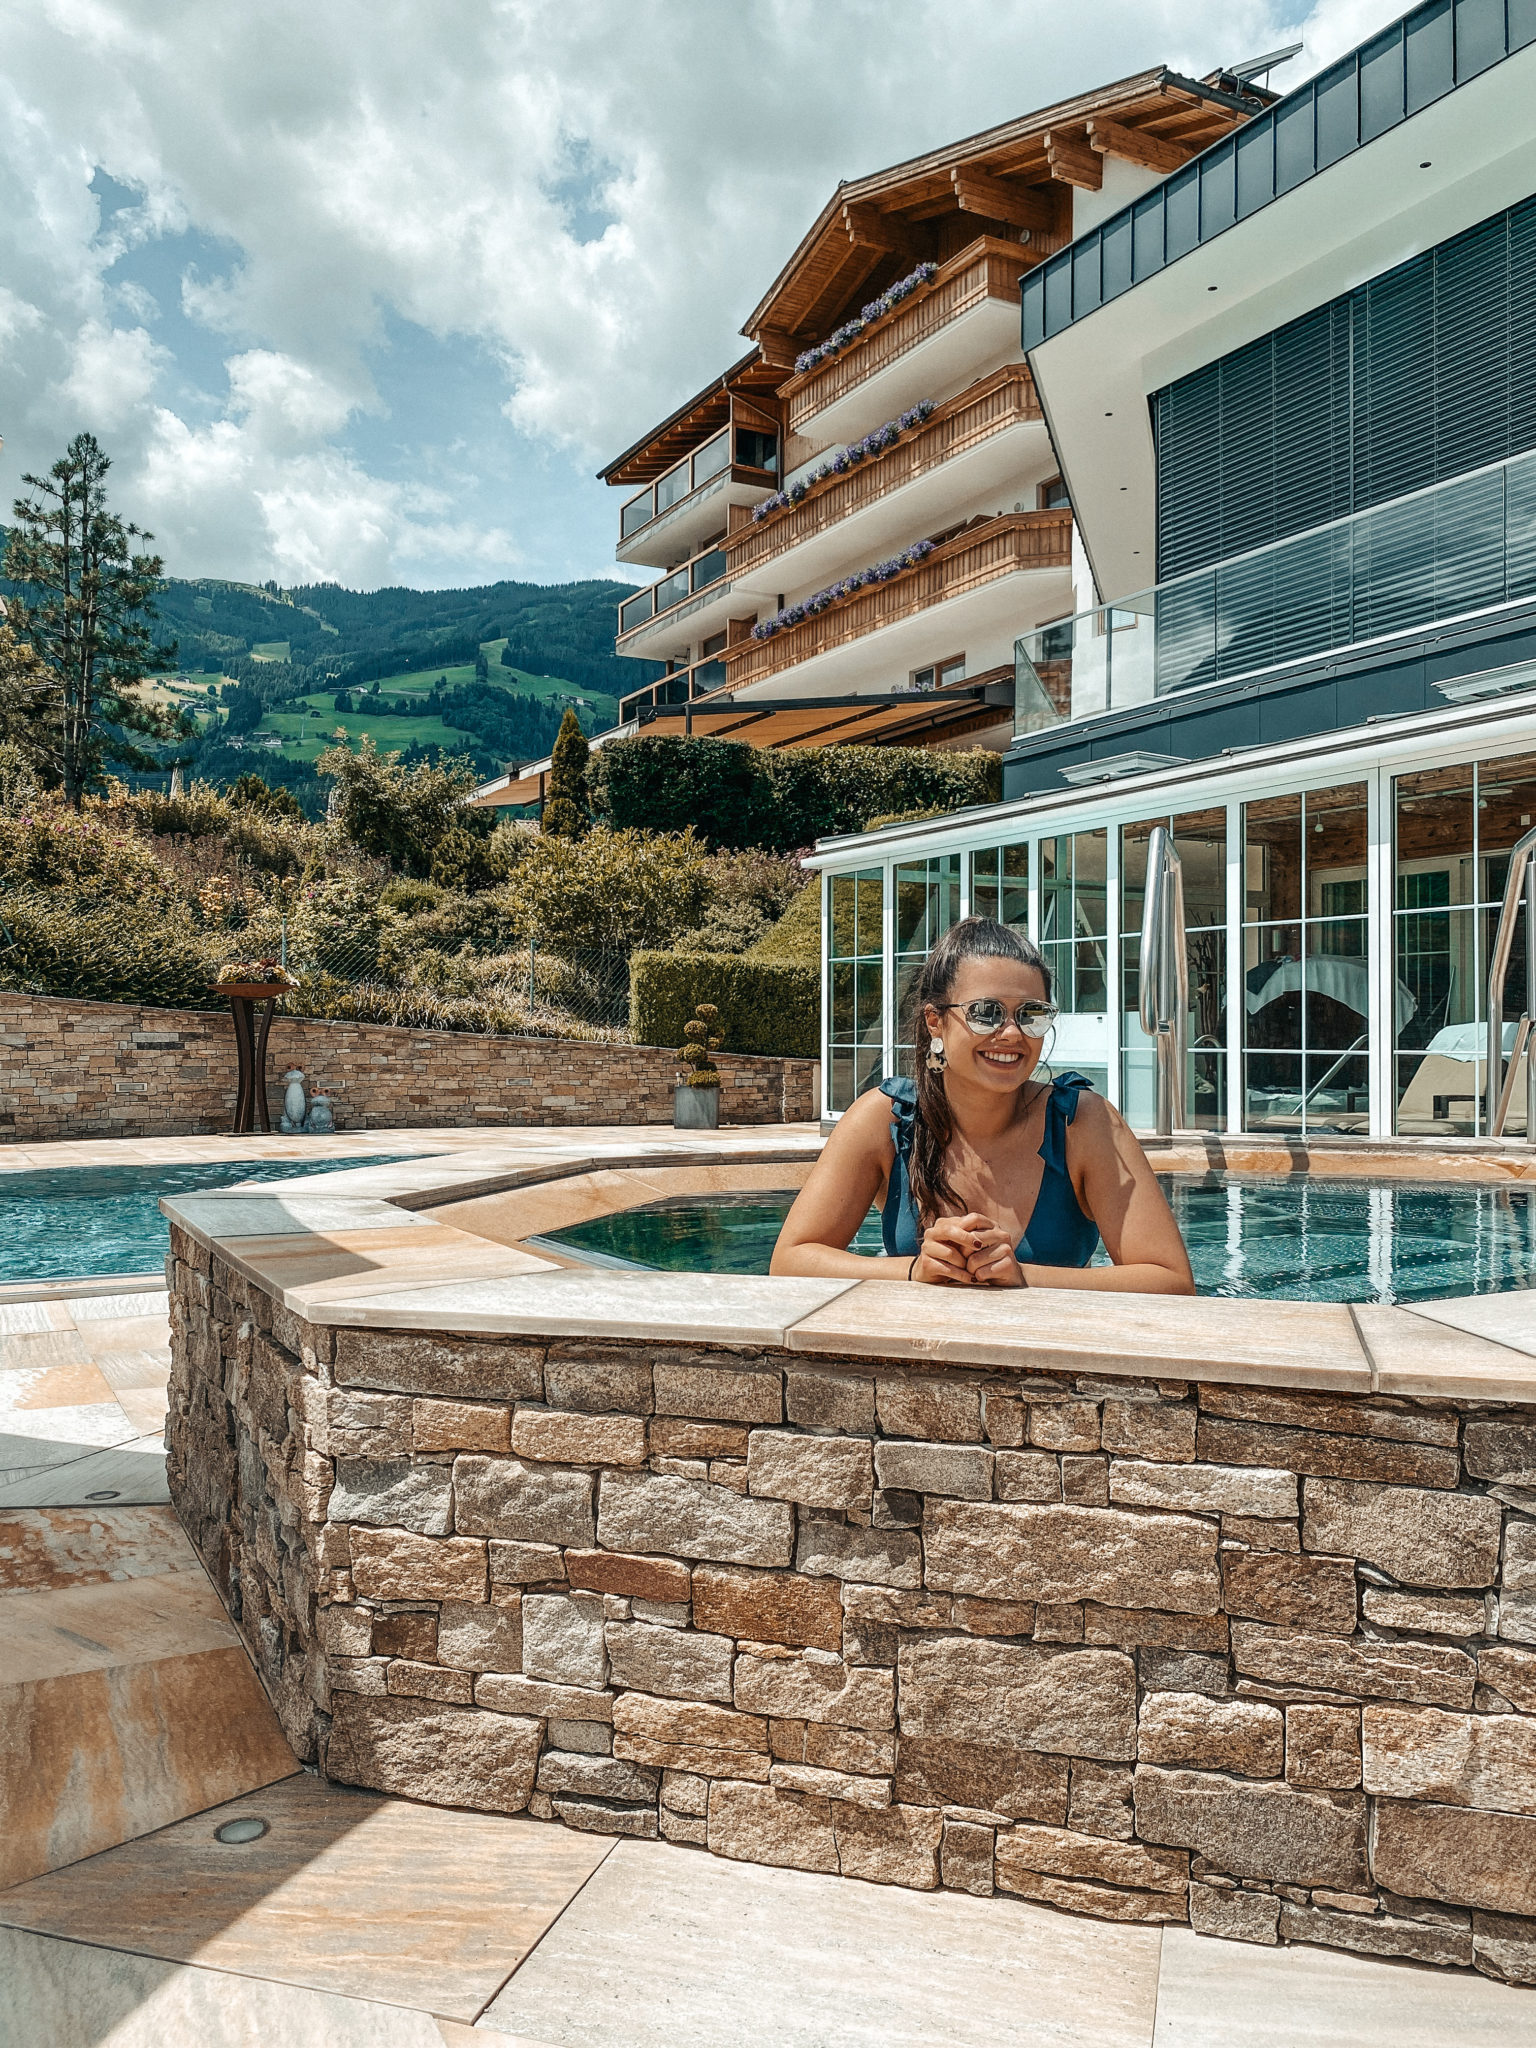 Erfahrungsbericht Hotel Held Zillertal